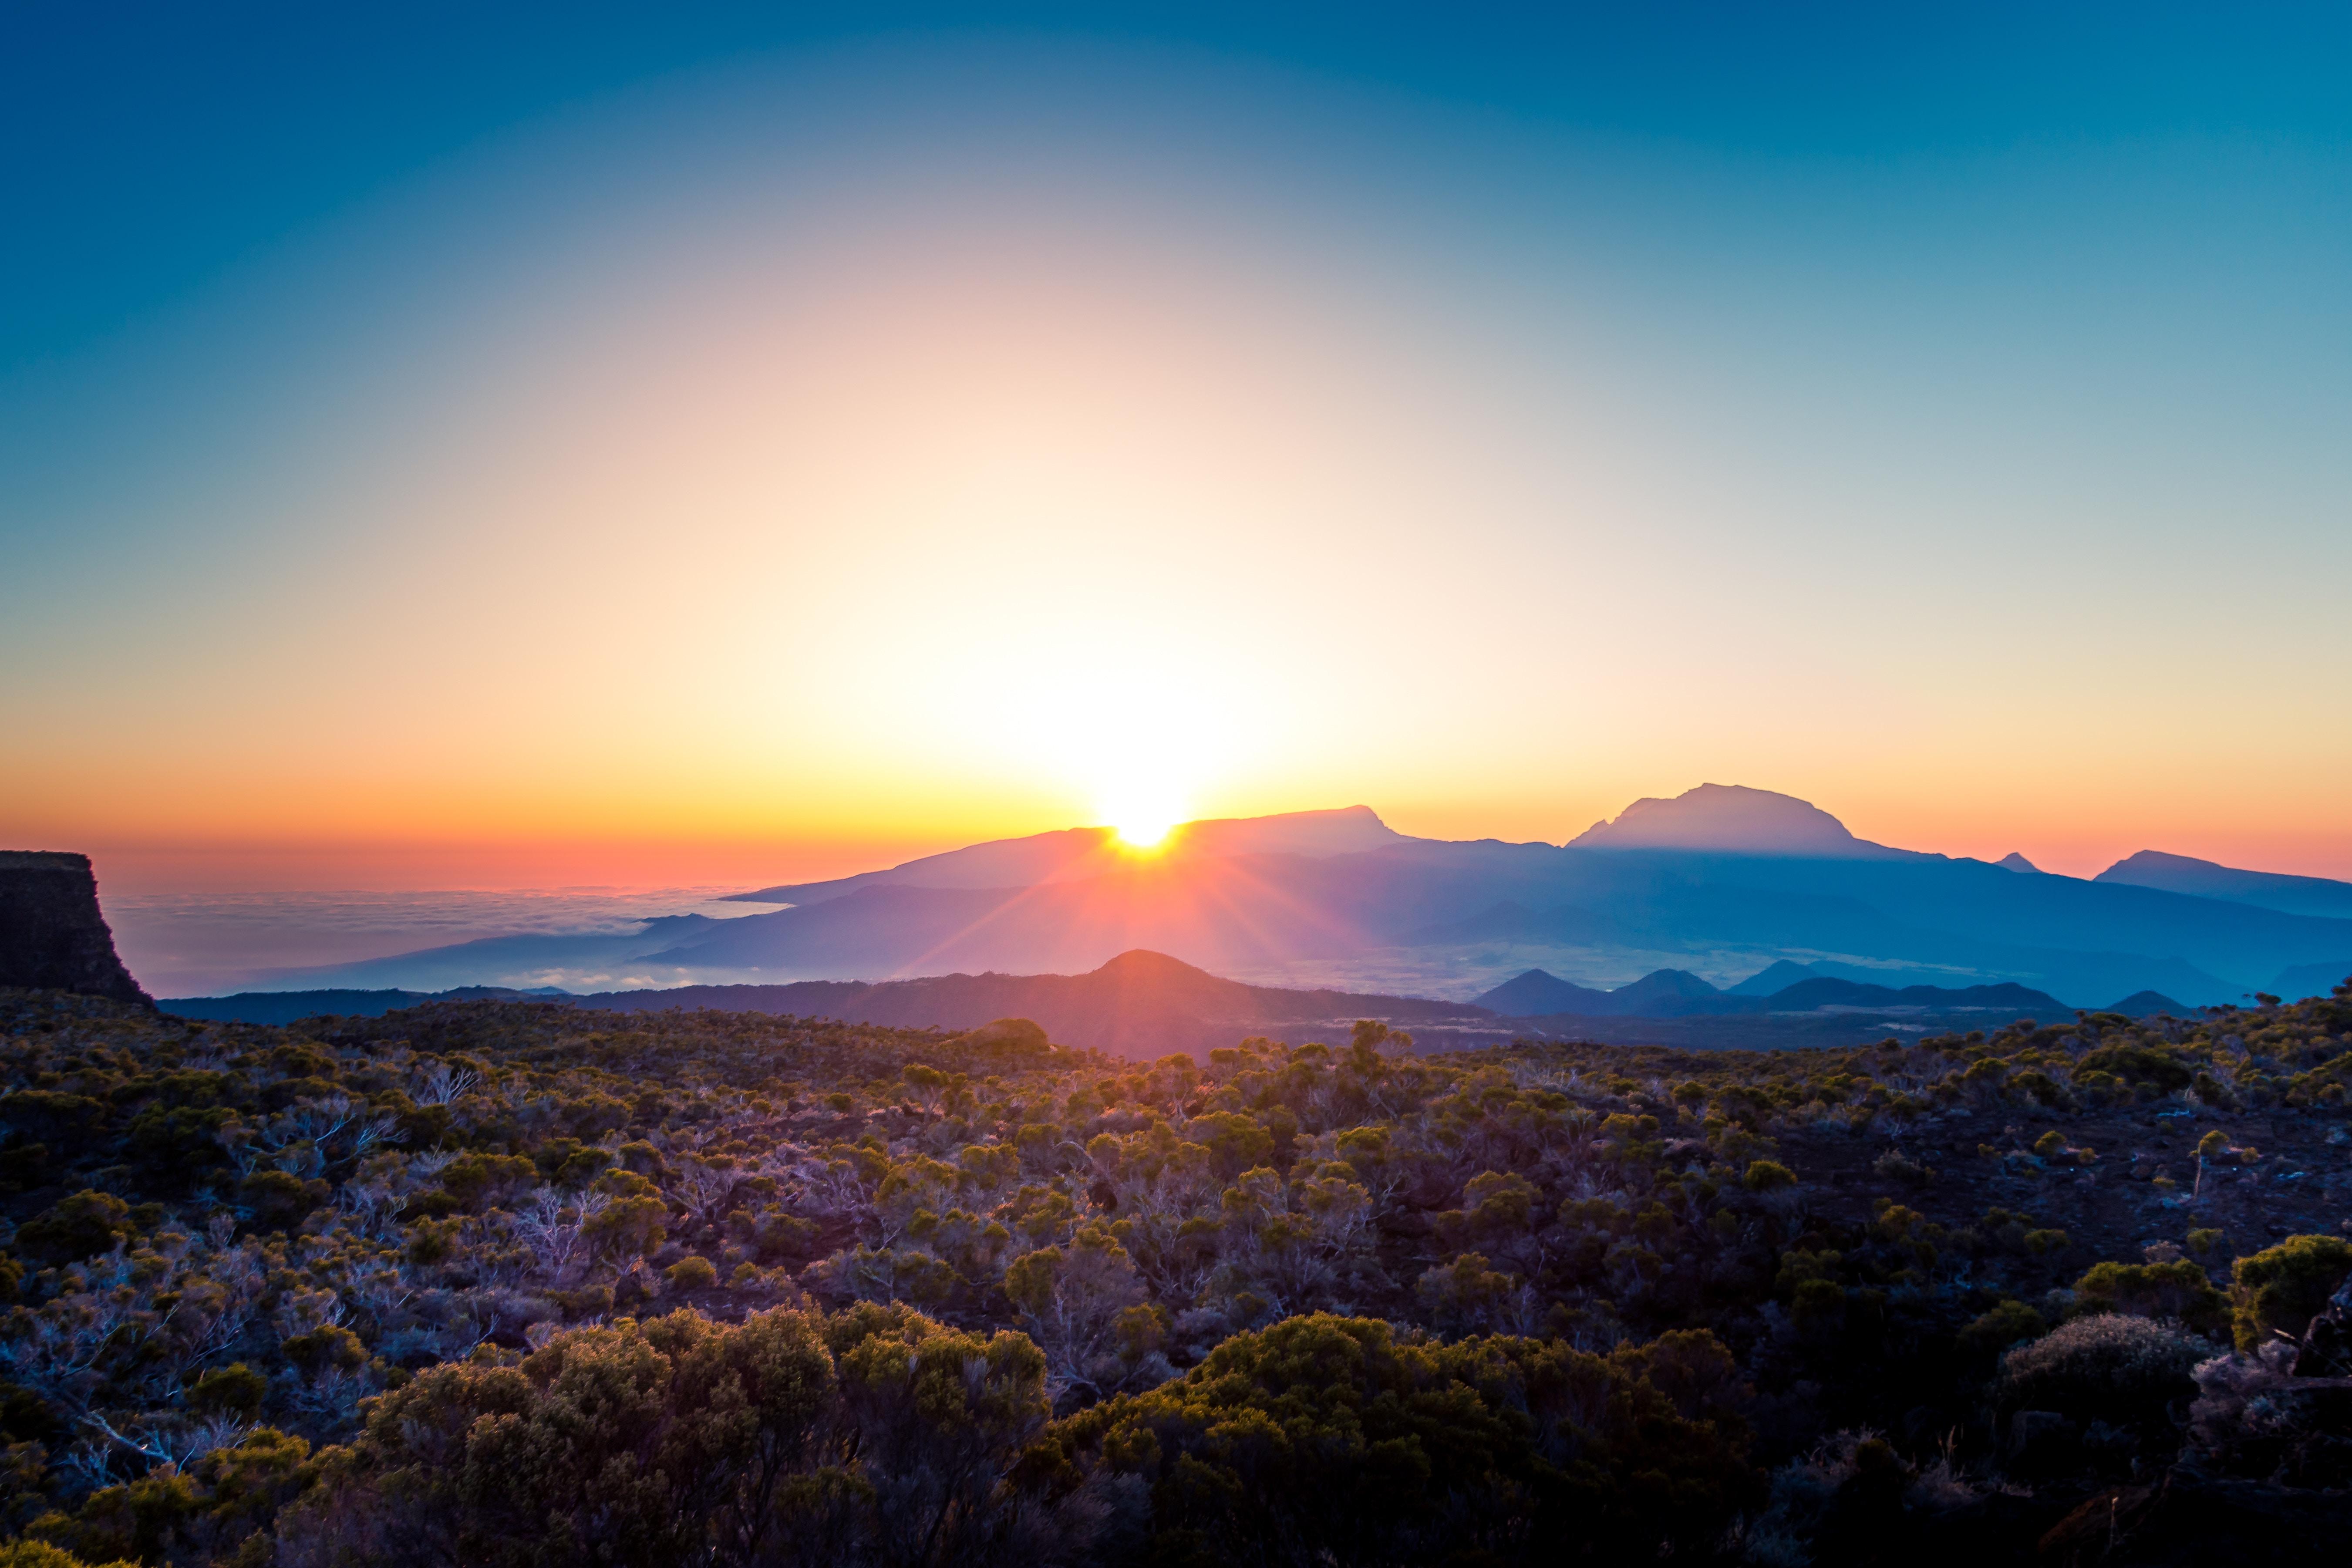 Beautiful Morning Sky Landscape Sunshine 5k, HD Nature, 4k